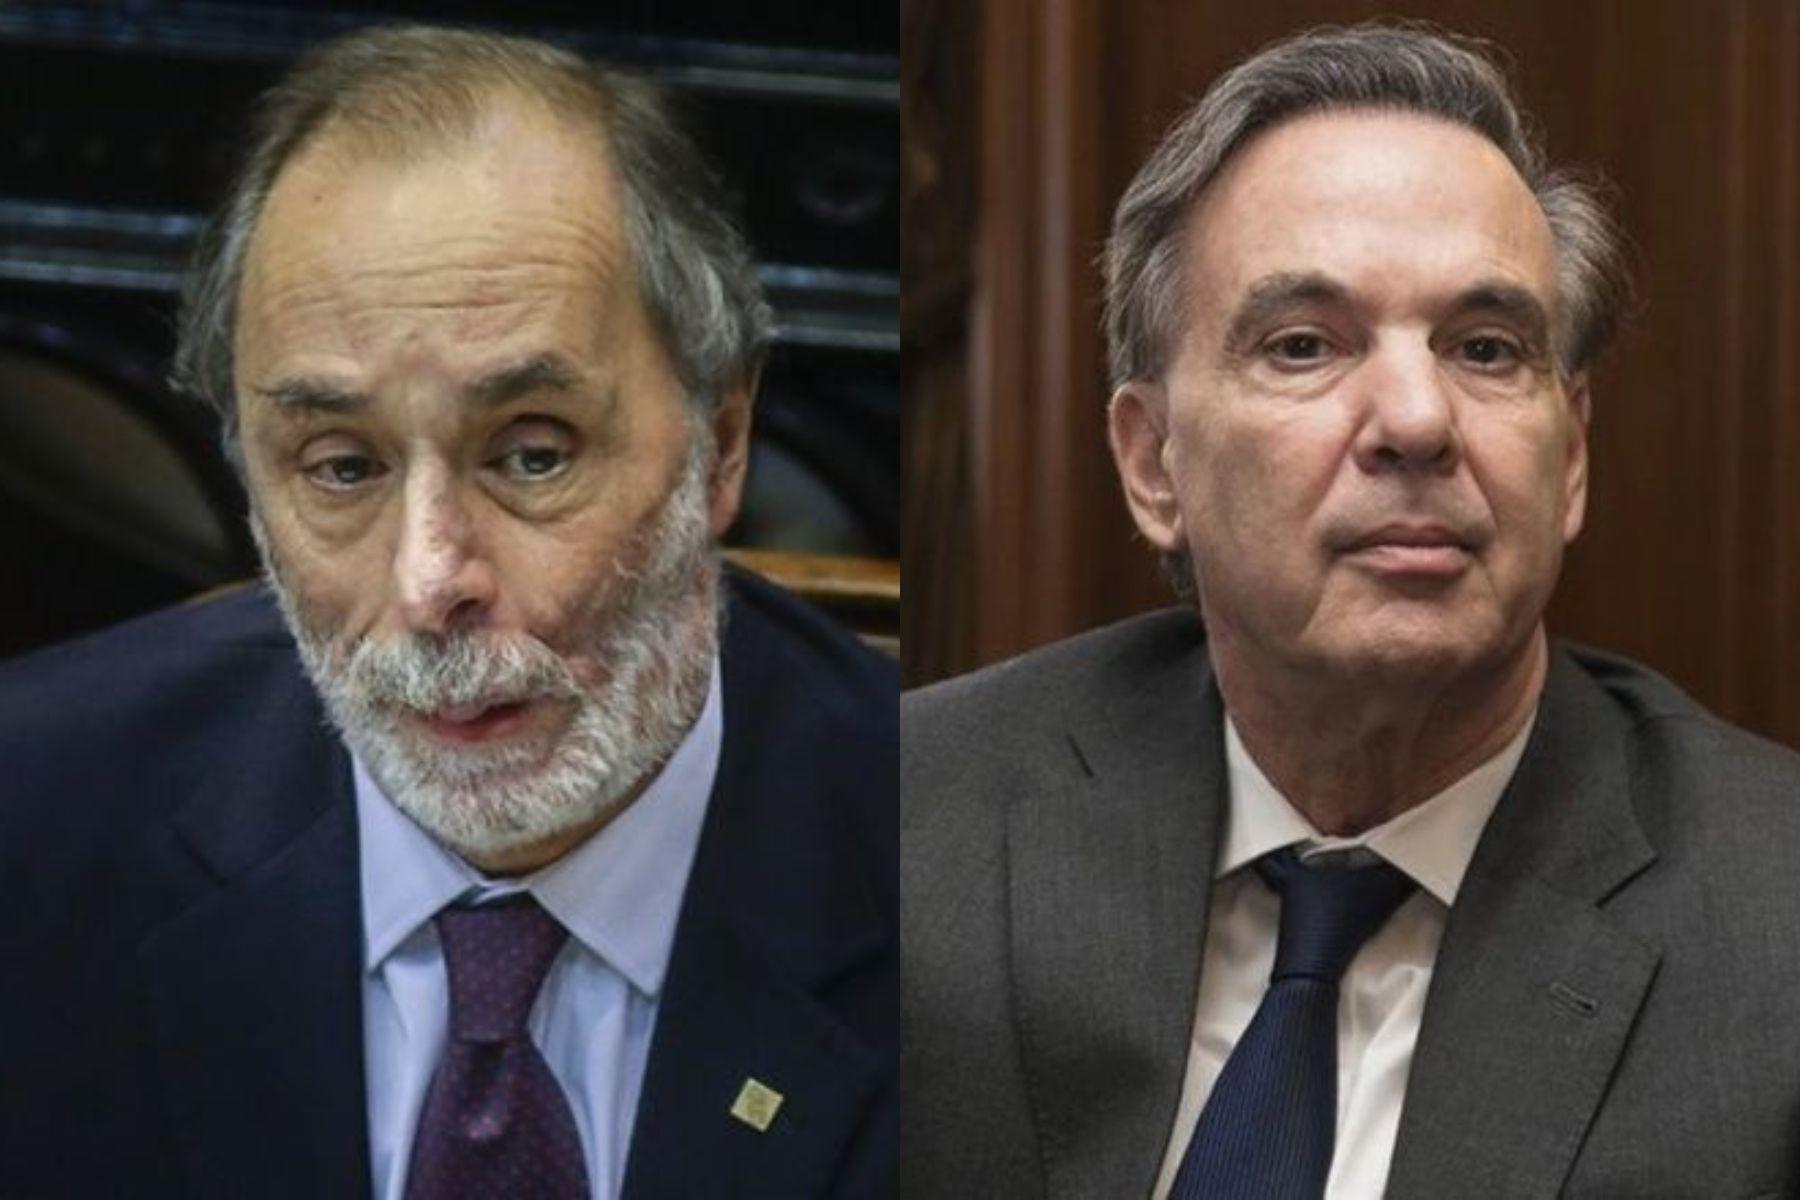 Pablo Tonelli yMiguel Ángel Pichetto